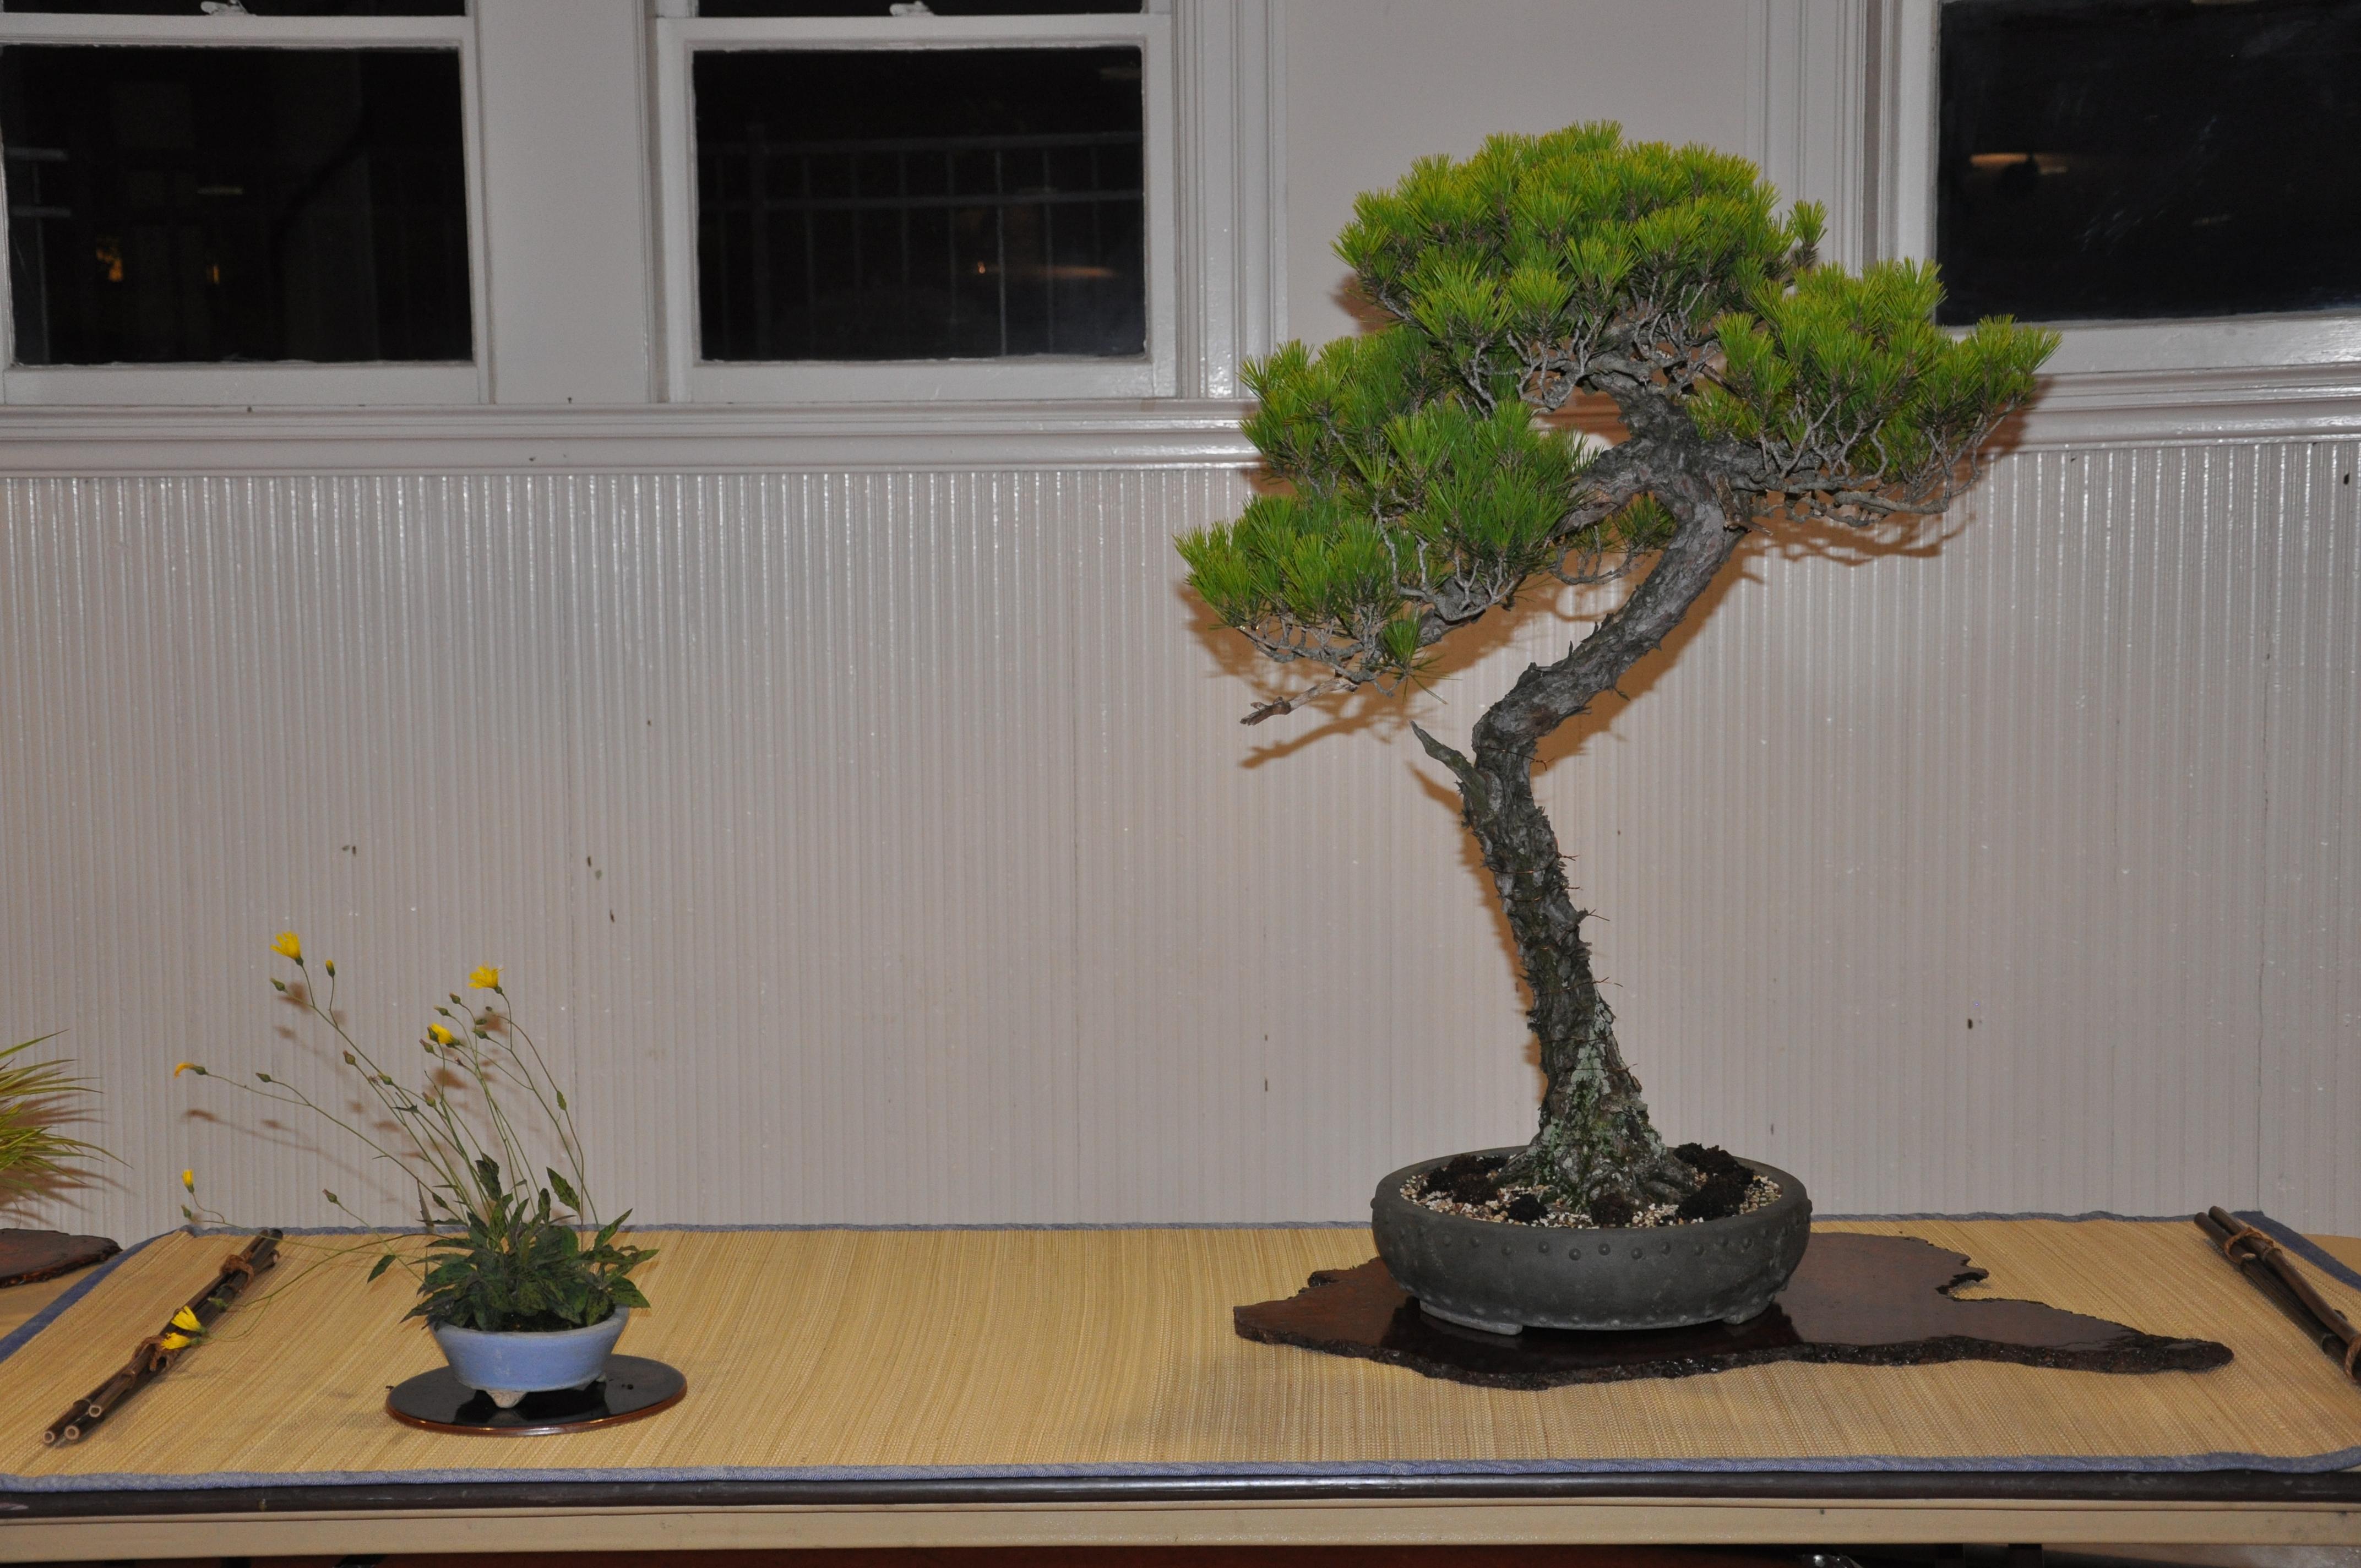 bonsai display 5,6-09 082